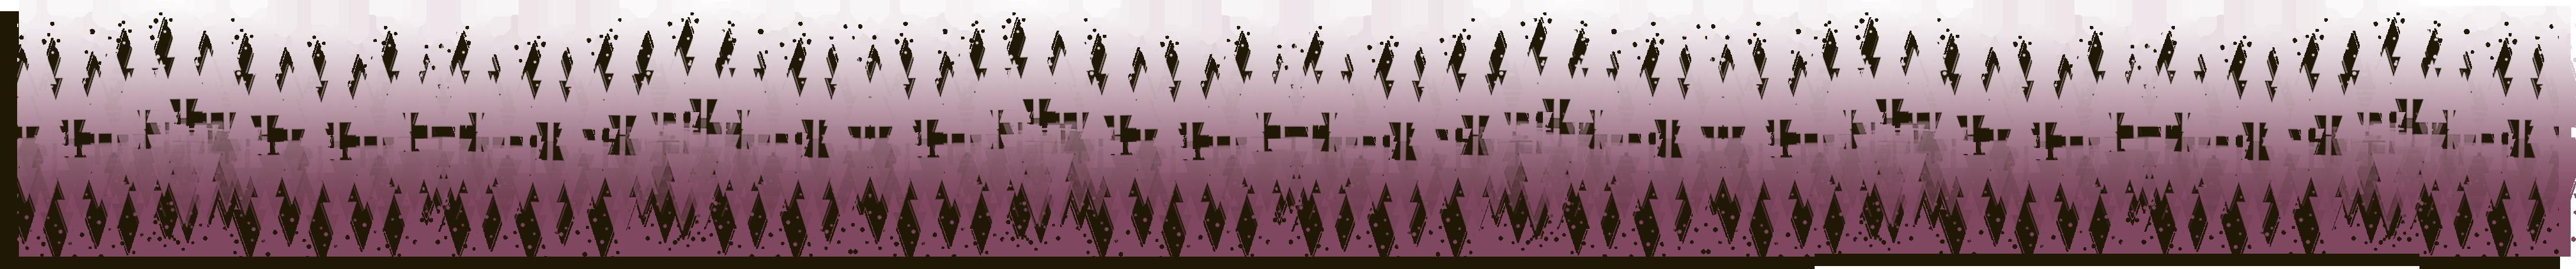 http://res.cloudinary.com/wiab/image/private/s--y9itGnWF--/q_10/v1481408992/pink_tree_small_wqqur5